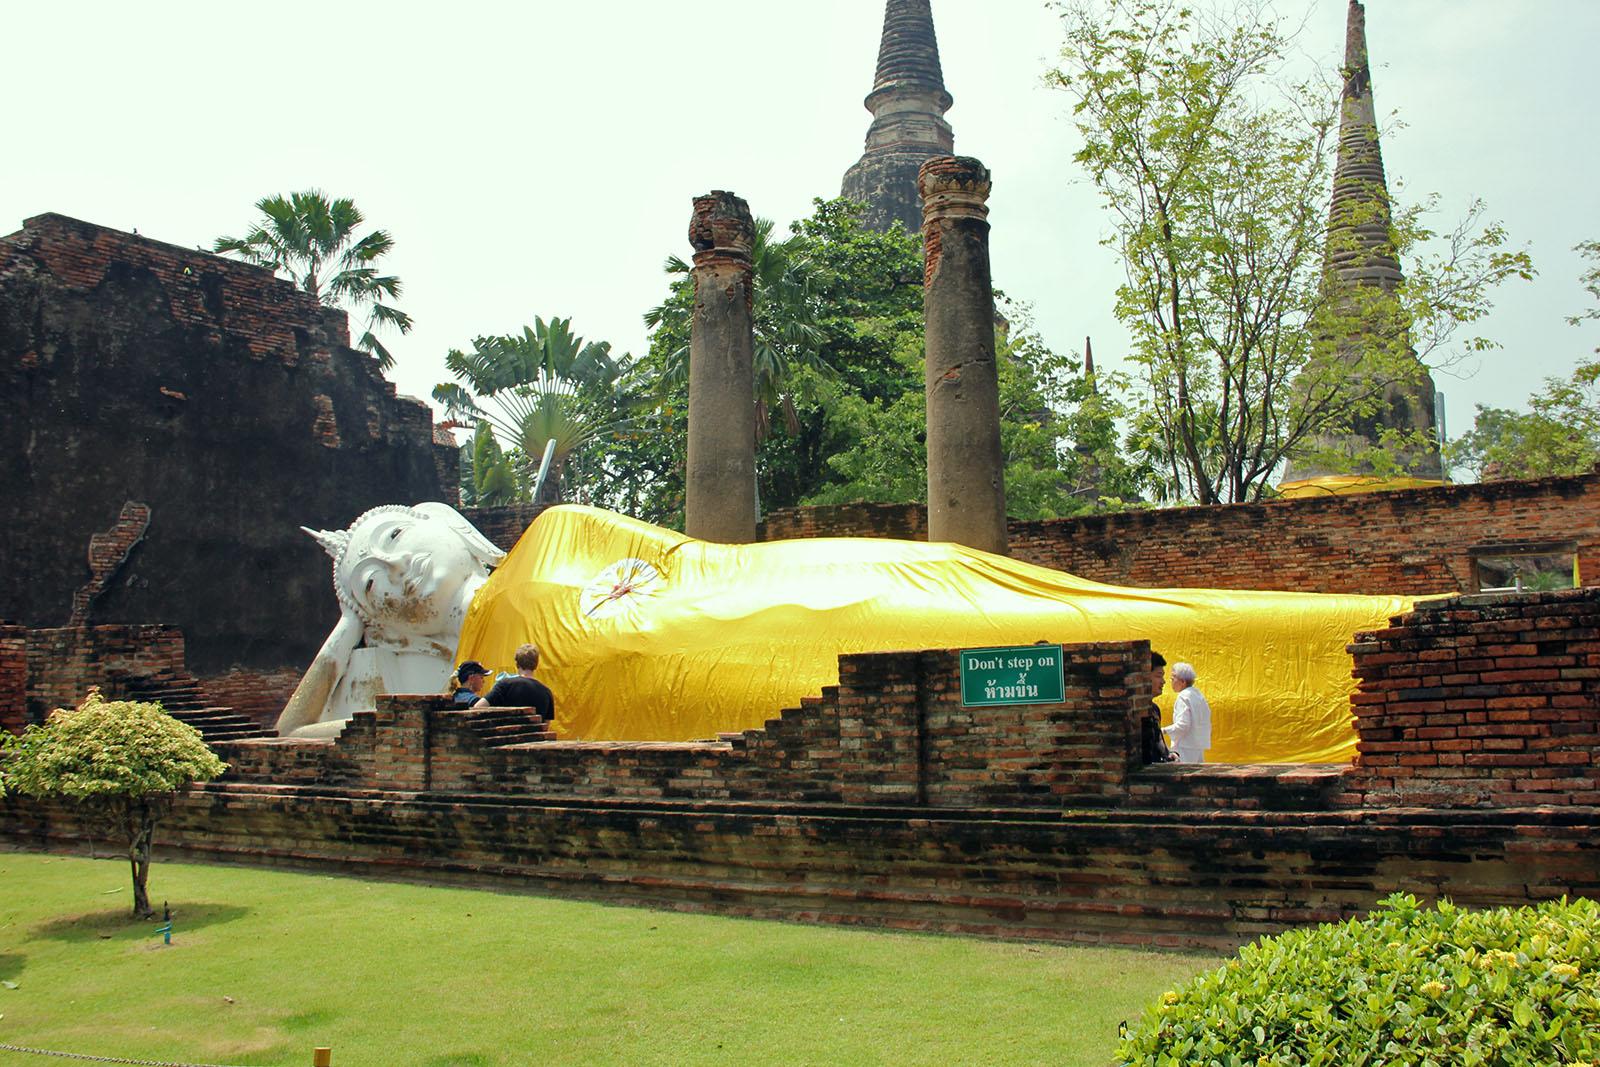 Reclining Buddha in Ayutthaya Thailand & Wat Pho Temple of Reclining Buddha - Thailand islam-shia.org